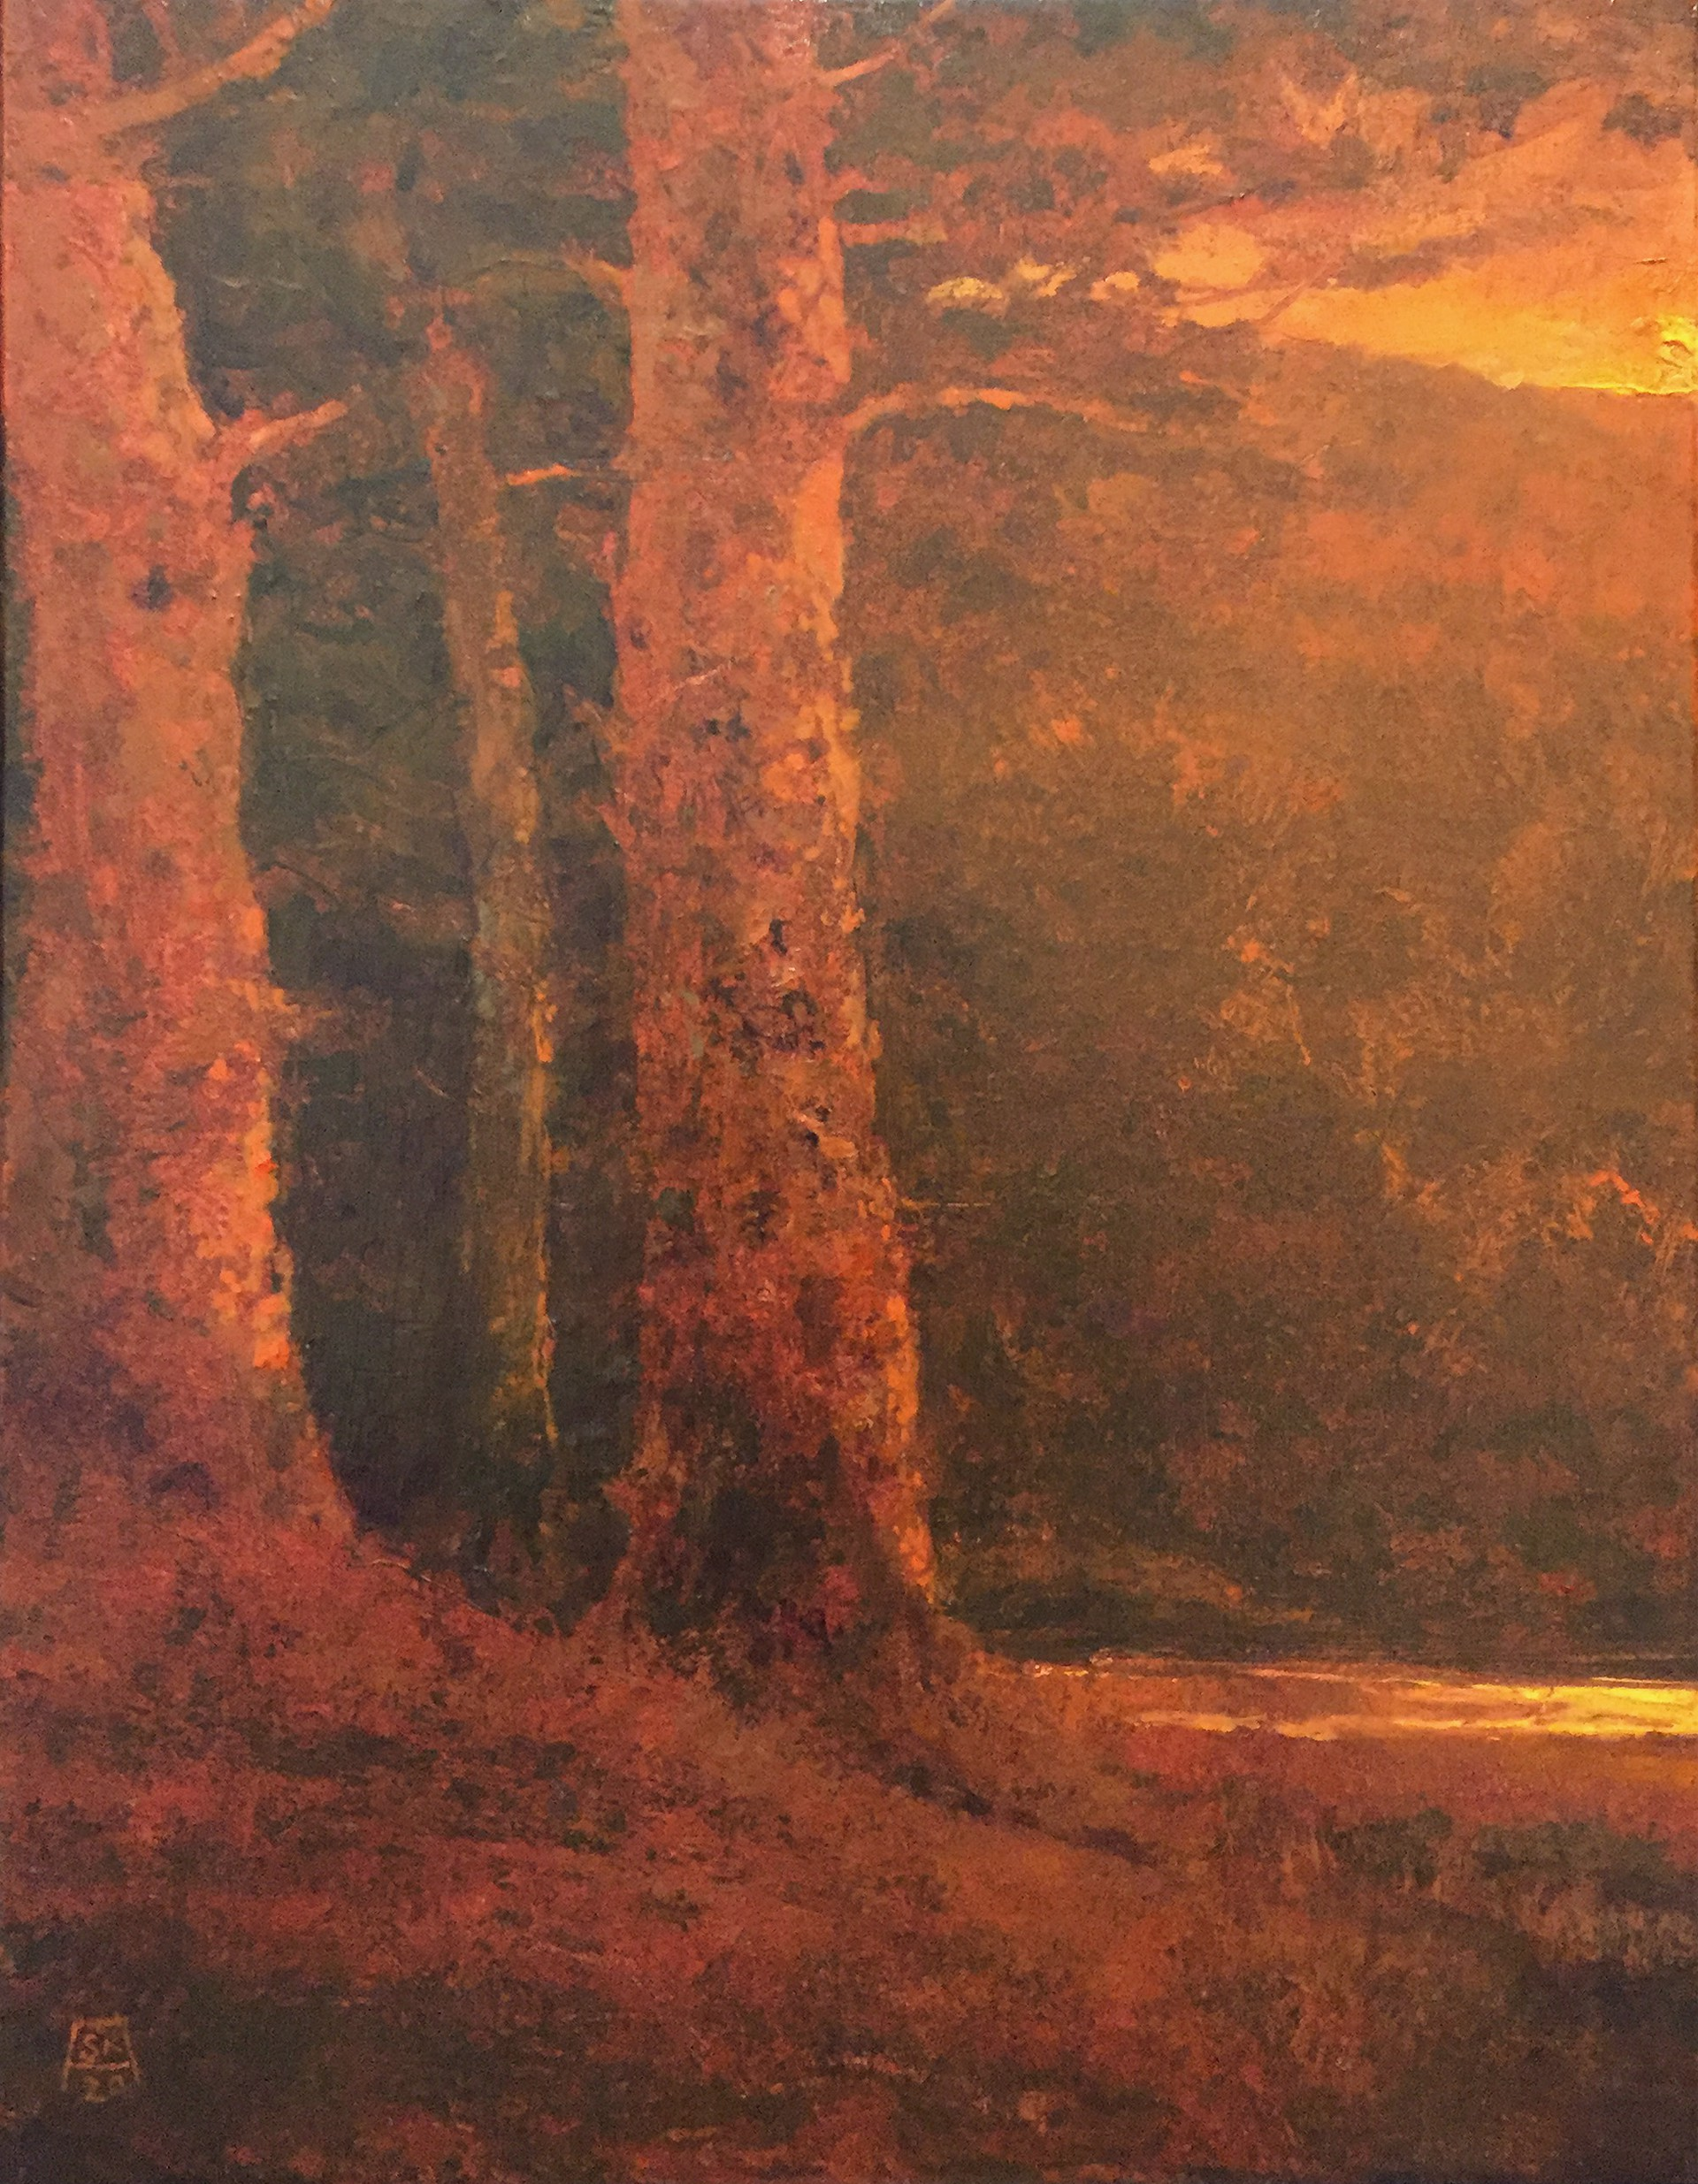 Ghost Pines by Shawn Krueger